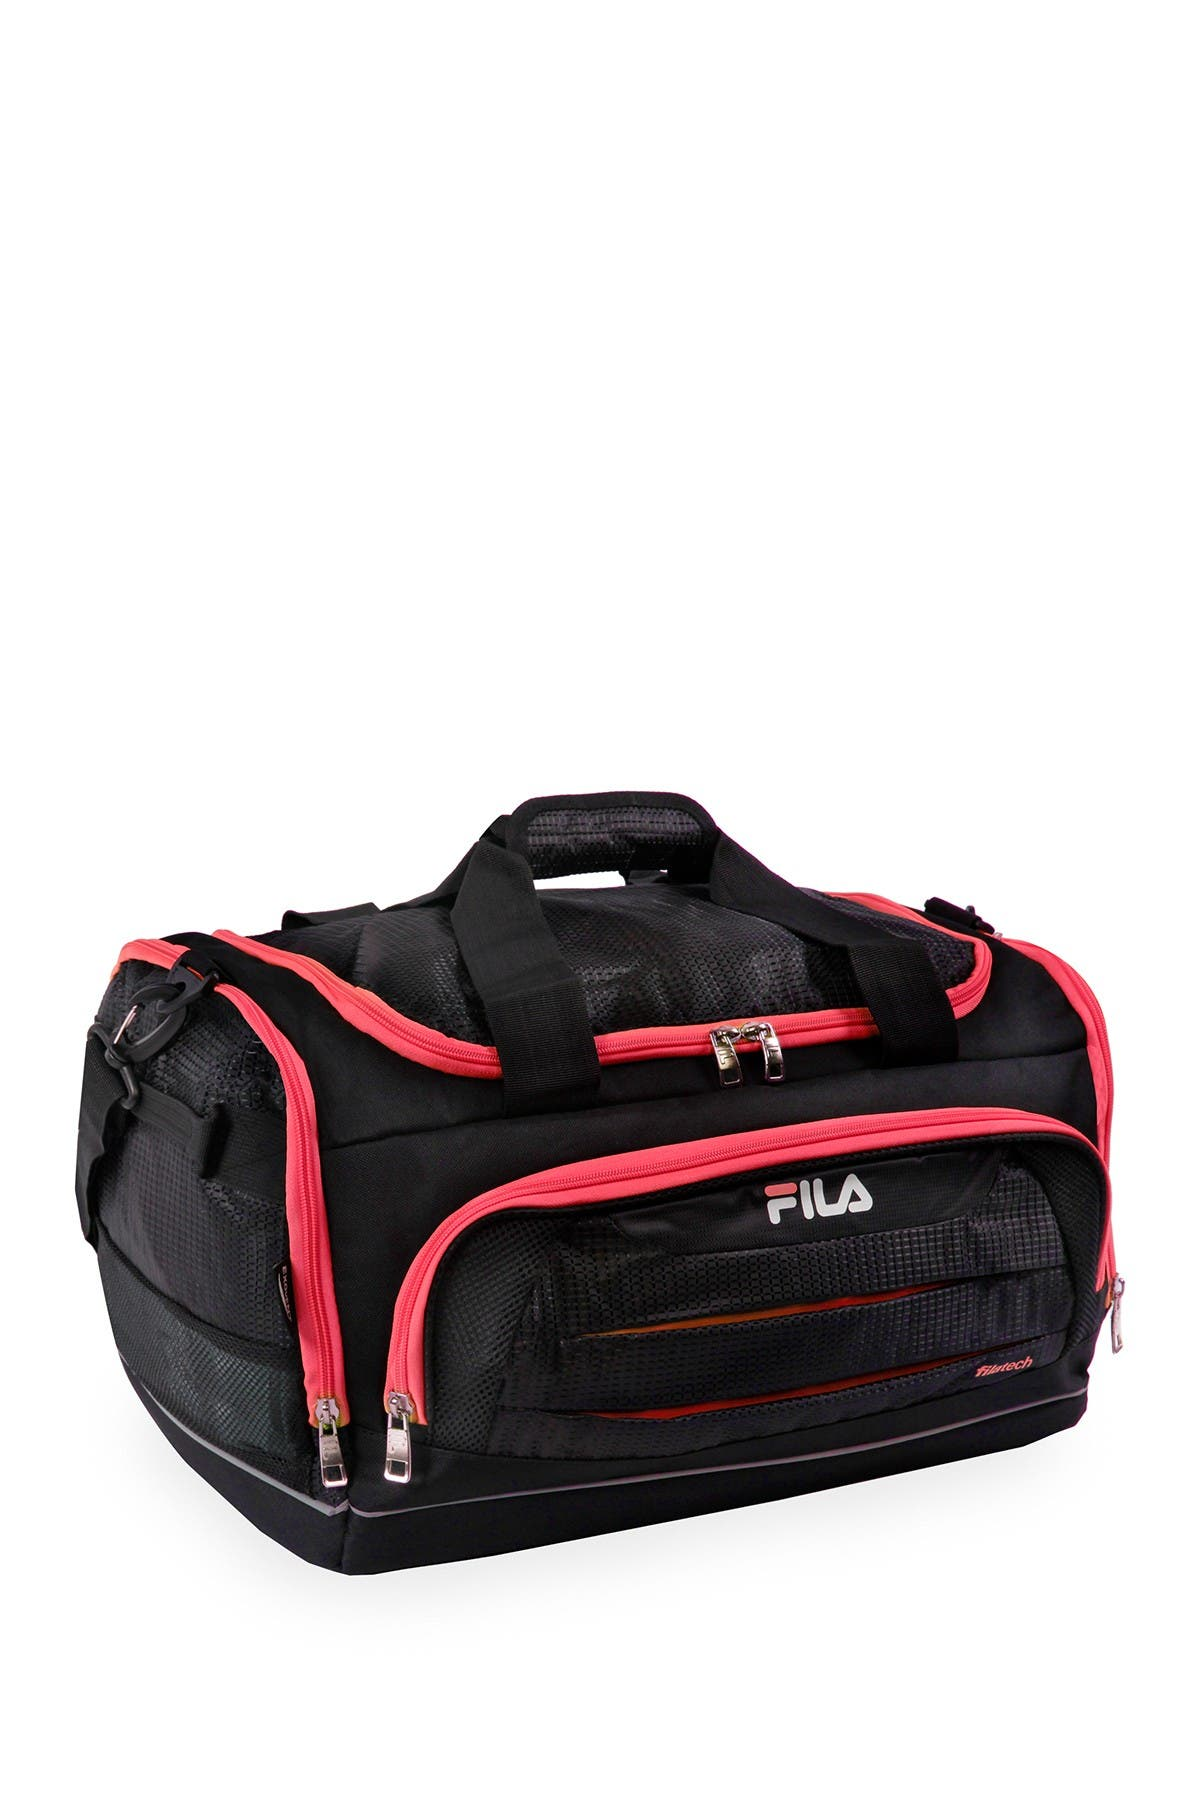 "Image of FILA USA Cypress 19"" Sport Duffel"